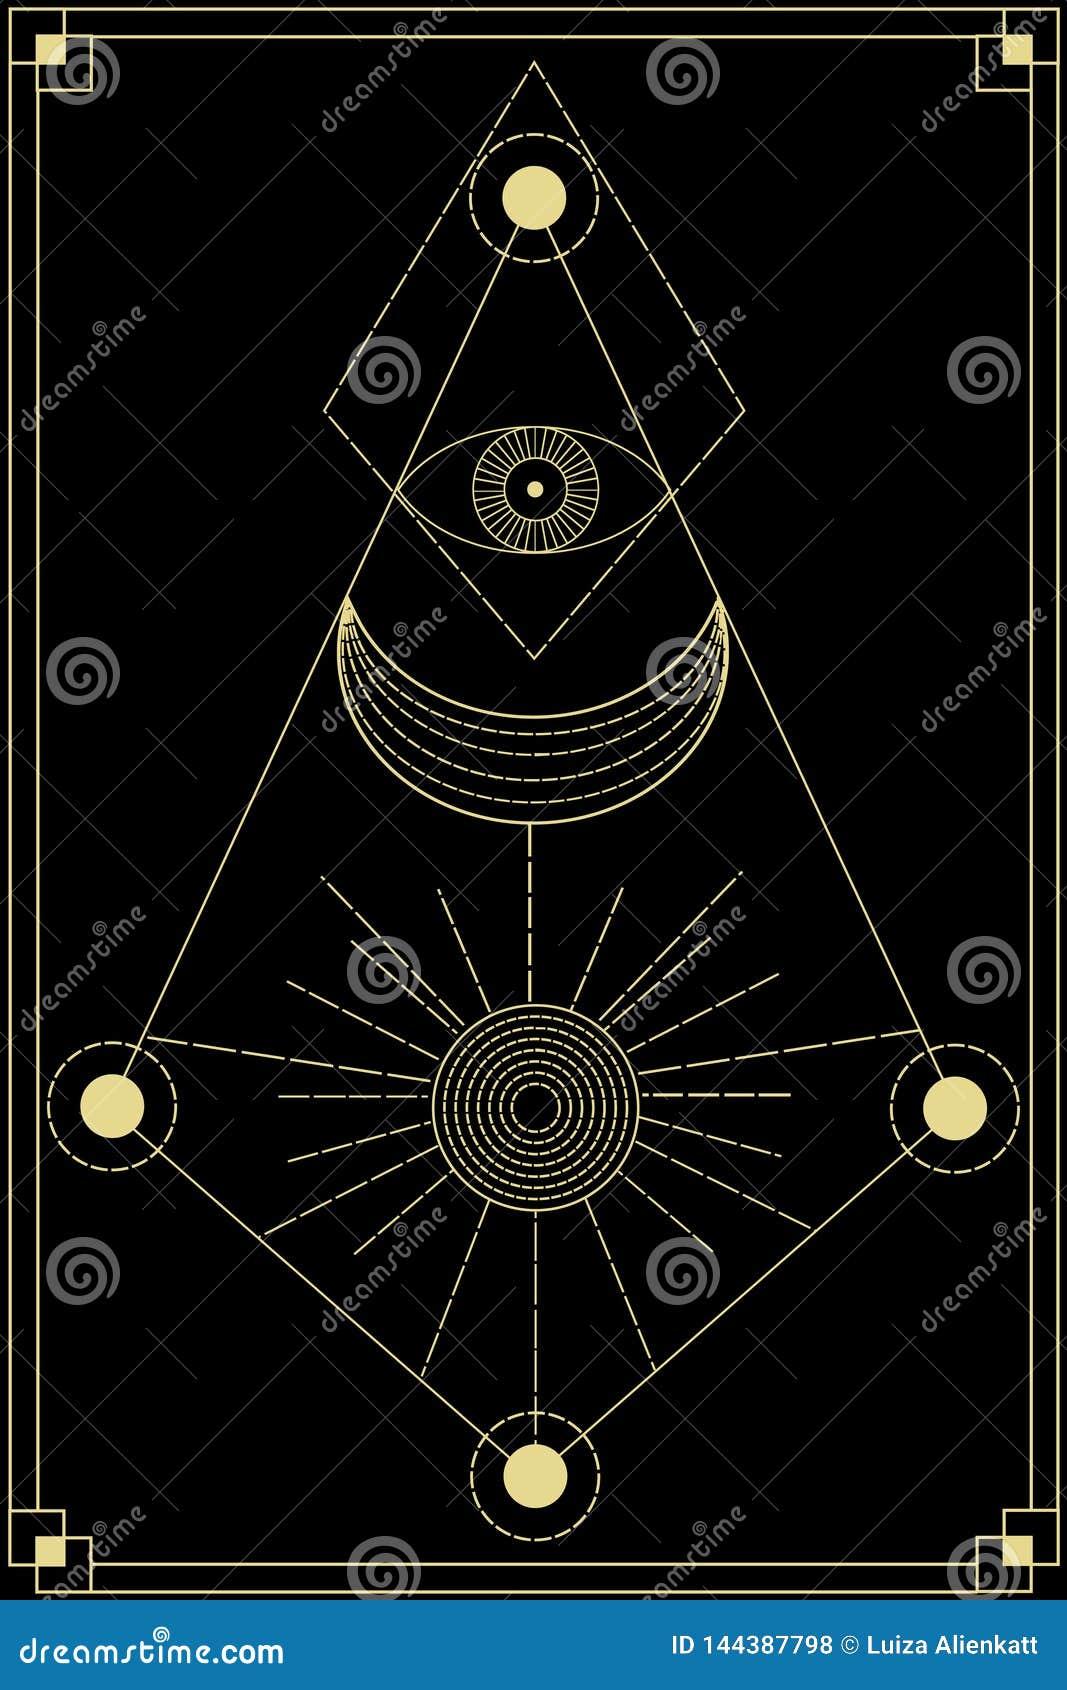 Sacred geometry symbols stock vector  Illustration of black